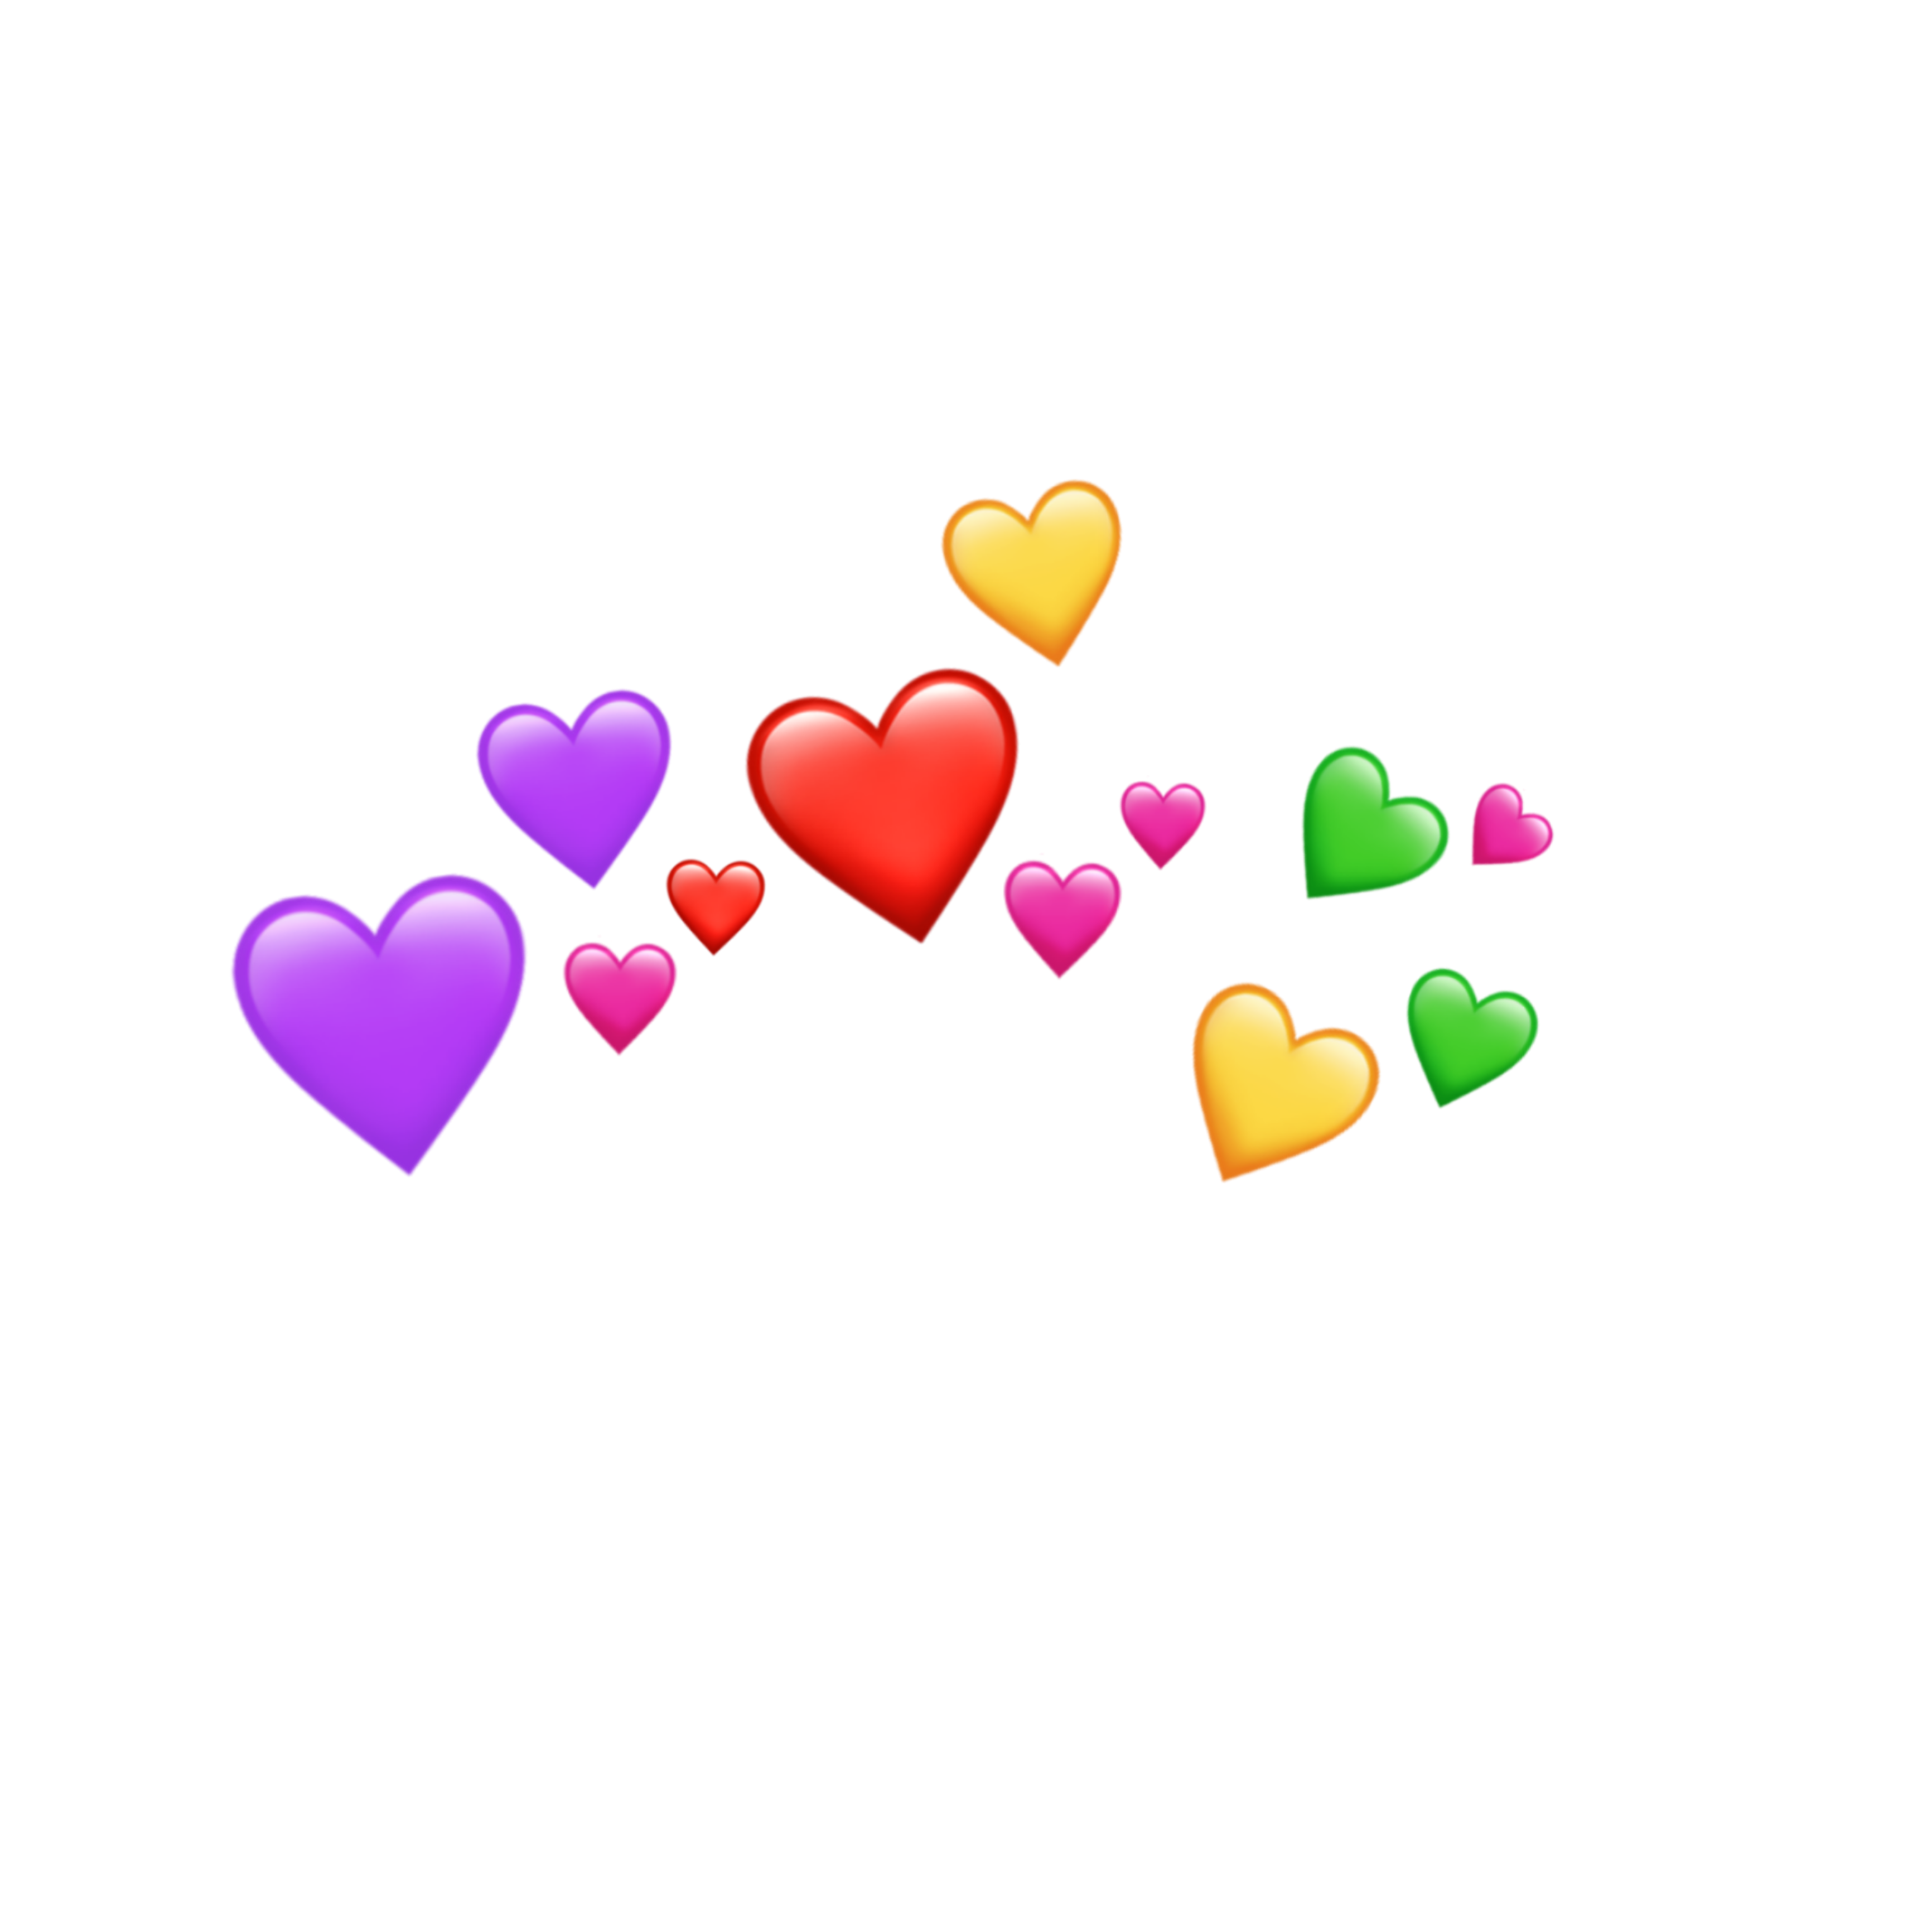 freetoedit#emoji #emojis #heart #crown #hearts | Logotipo do ...